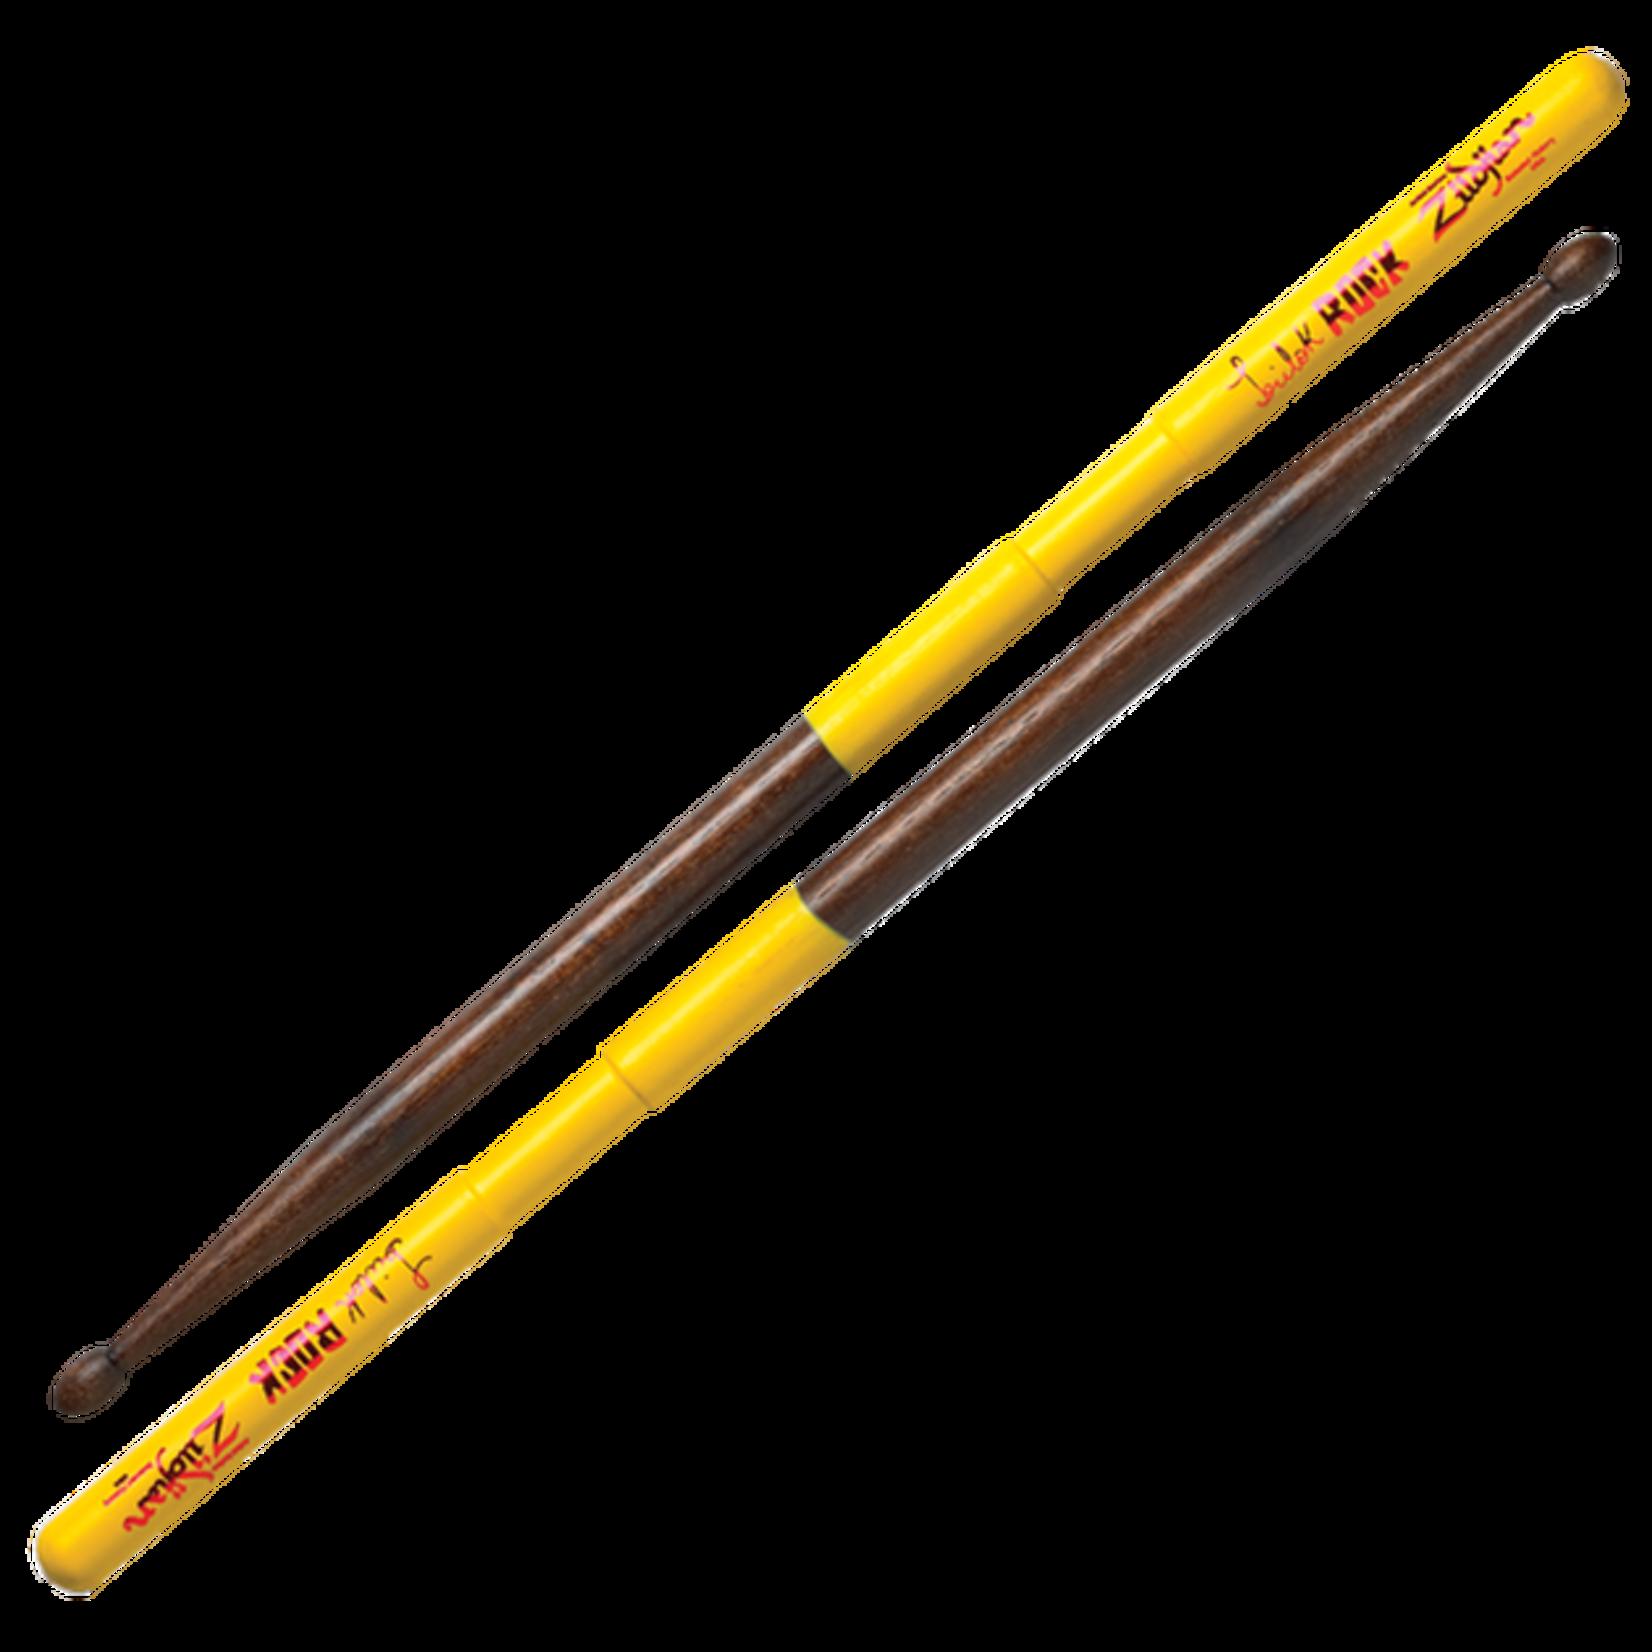 Zildjian Zildjian Trilok Gurtu Rock Artist Series Drumsticks